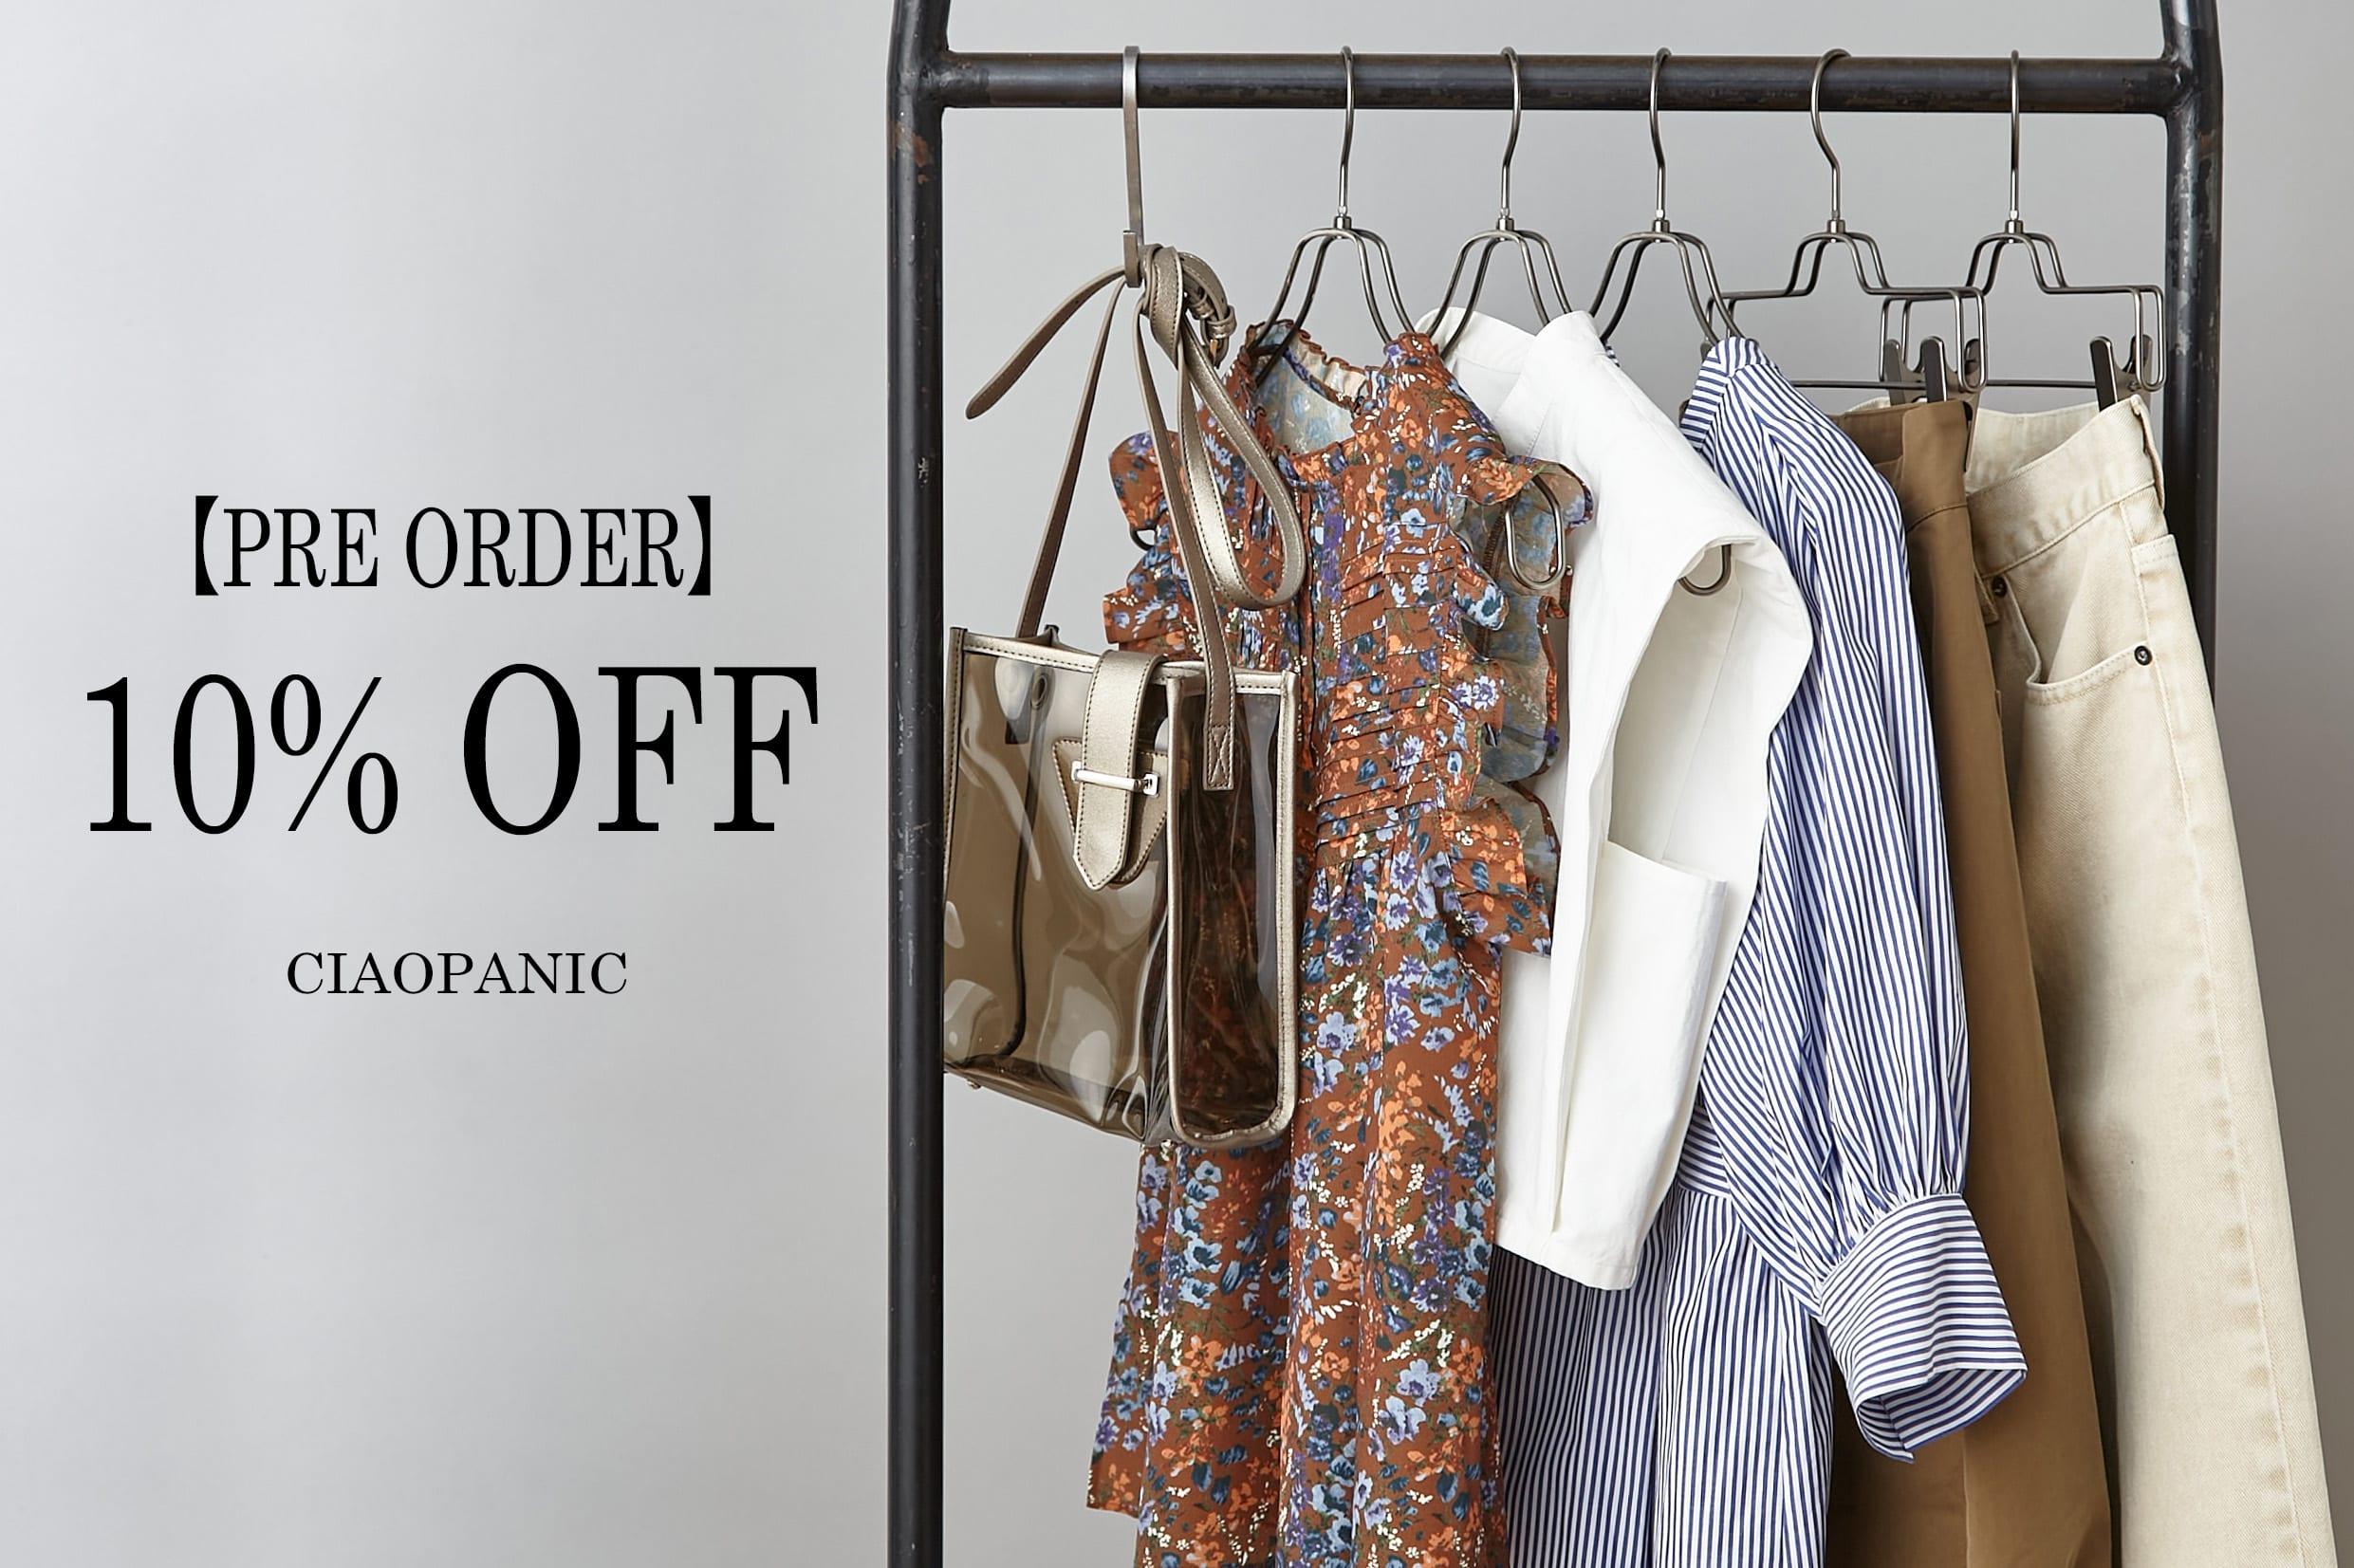 CIAOPANIC Womens PRE ORDER 10%OFF|予約商品が期間限定で10%オフ!